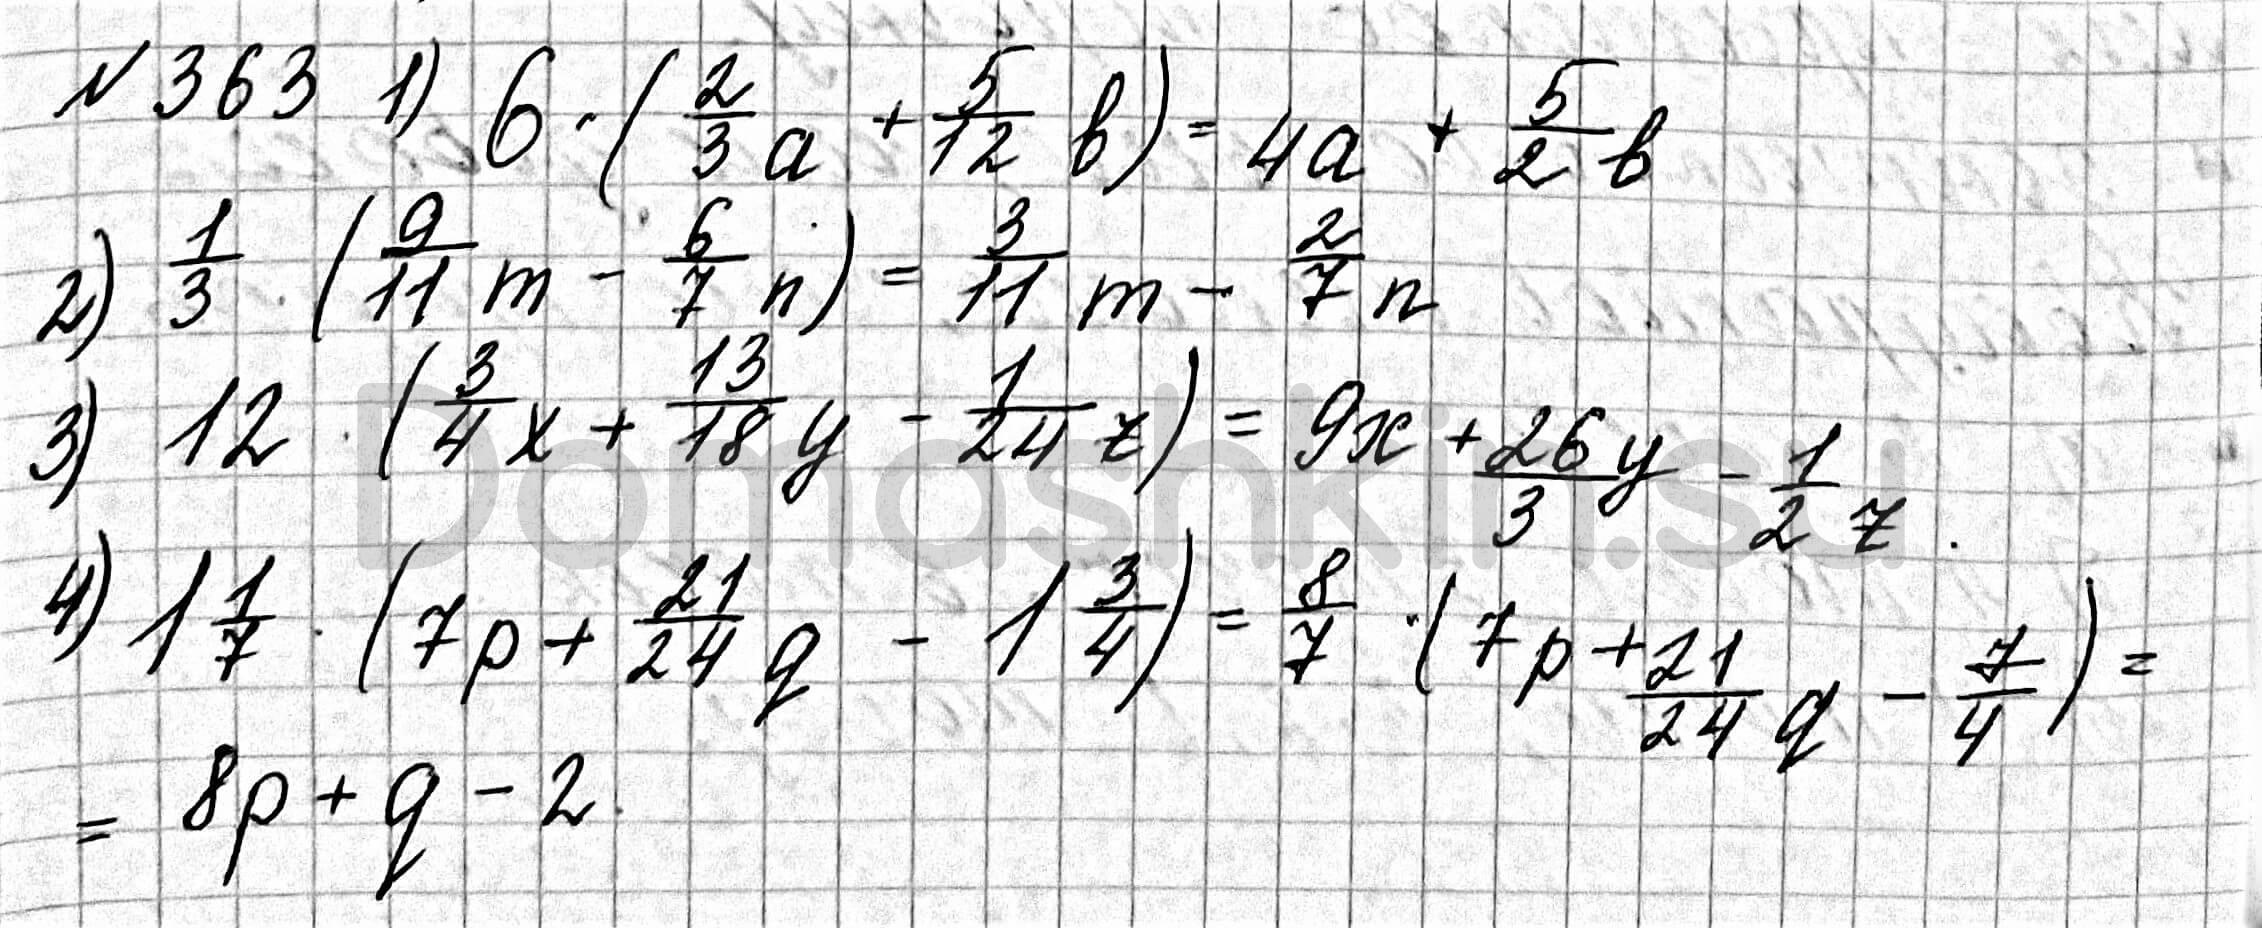 Математика 6 класс учебник Мерзляк номер 363 решение